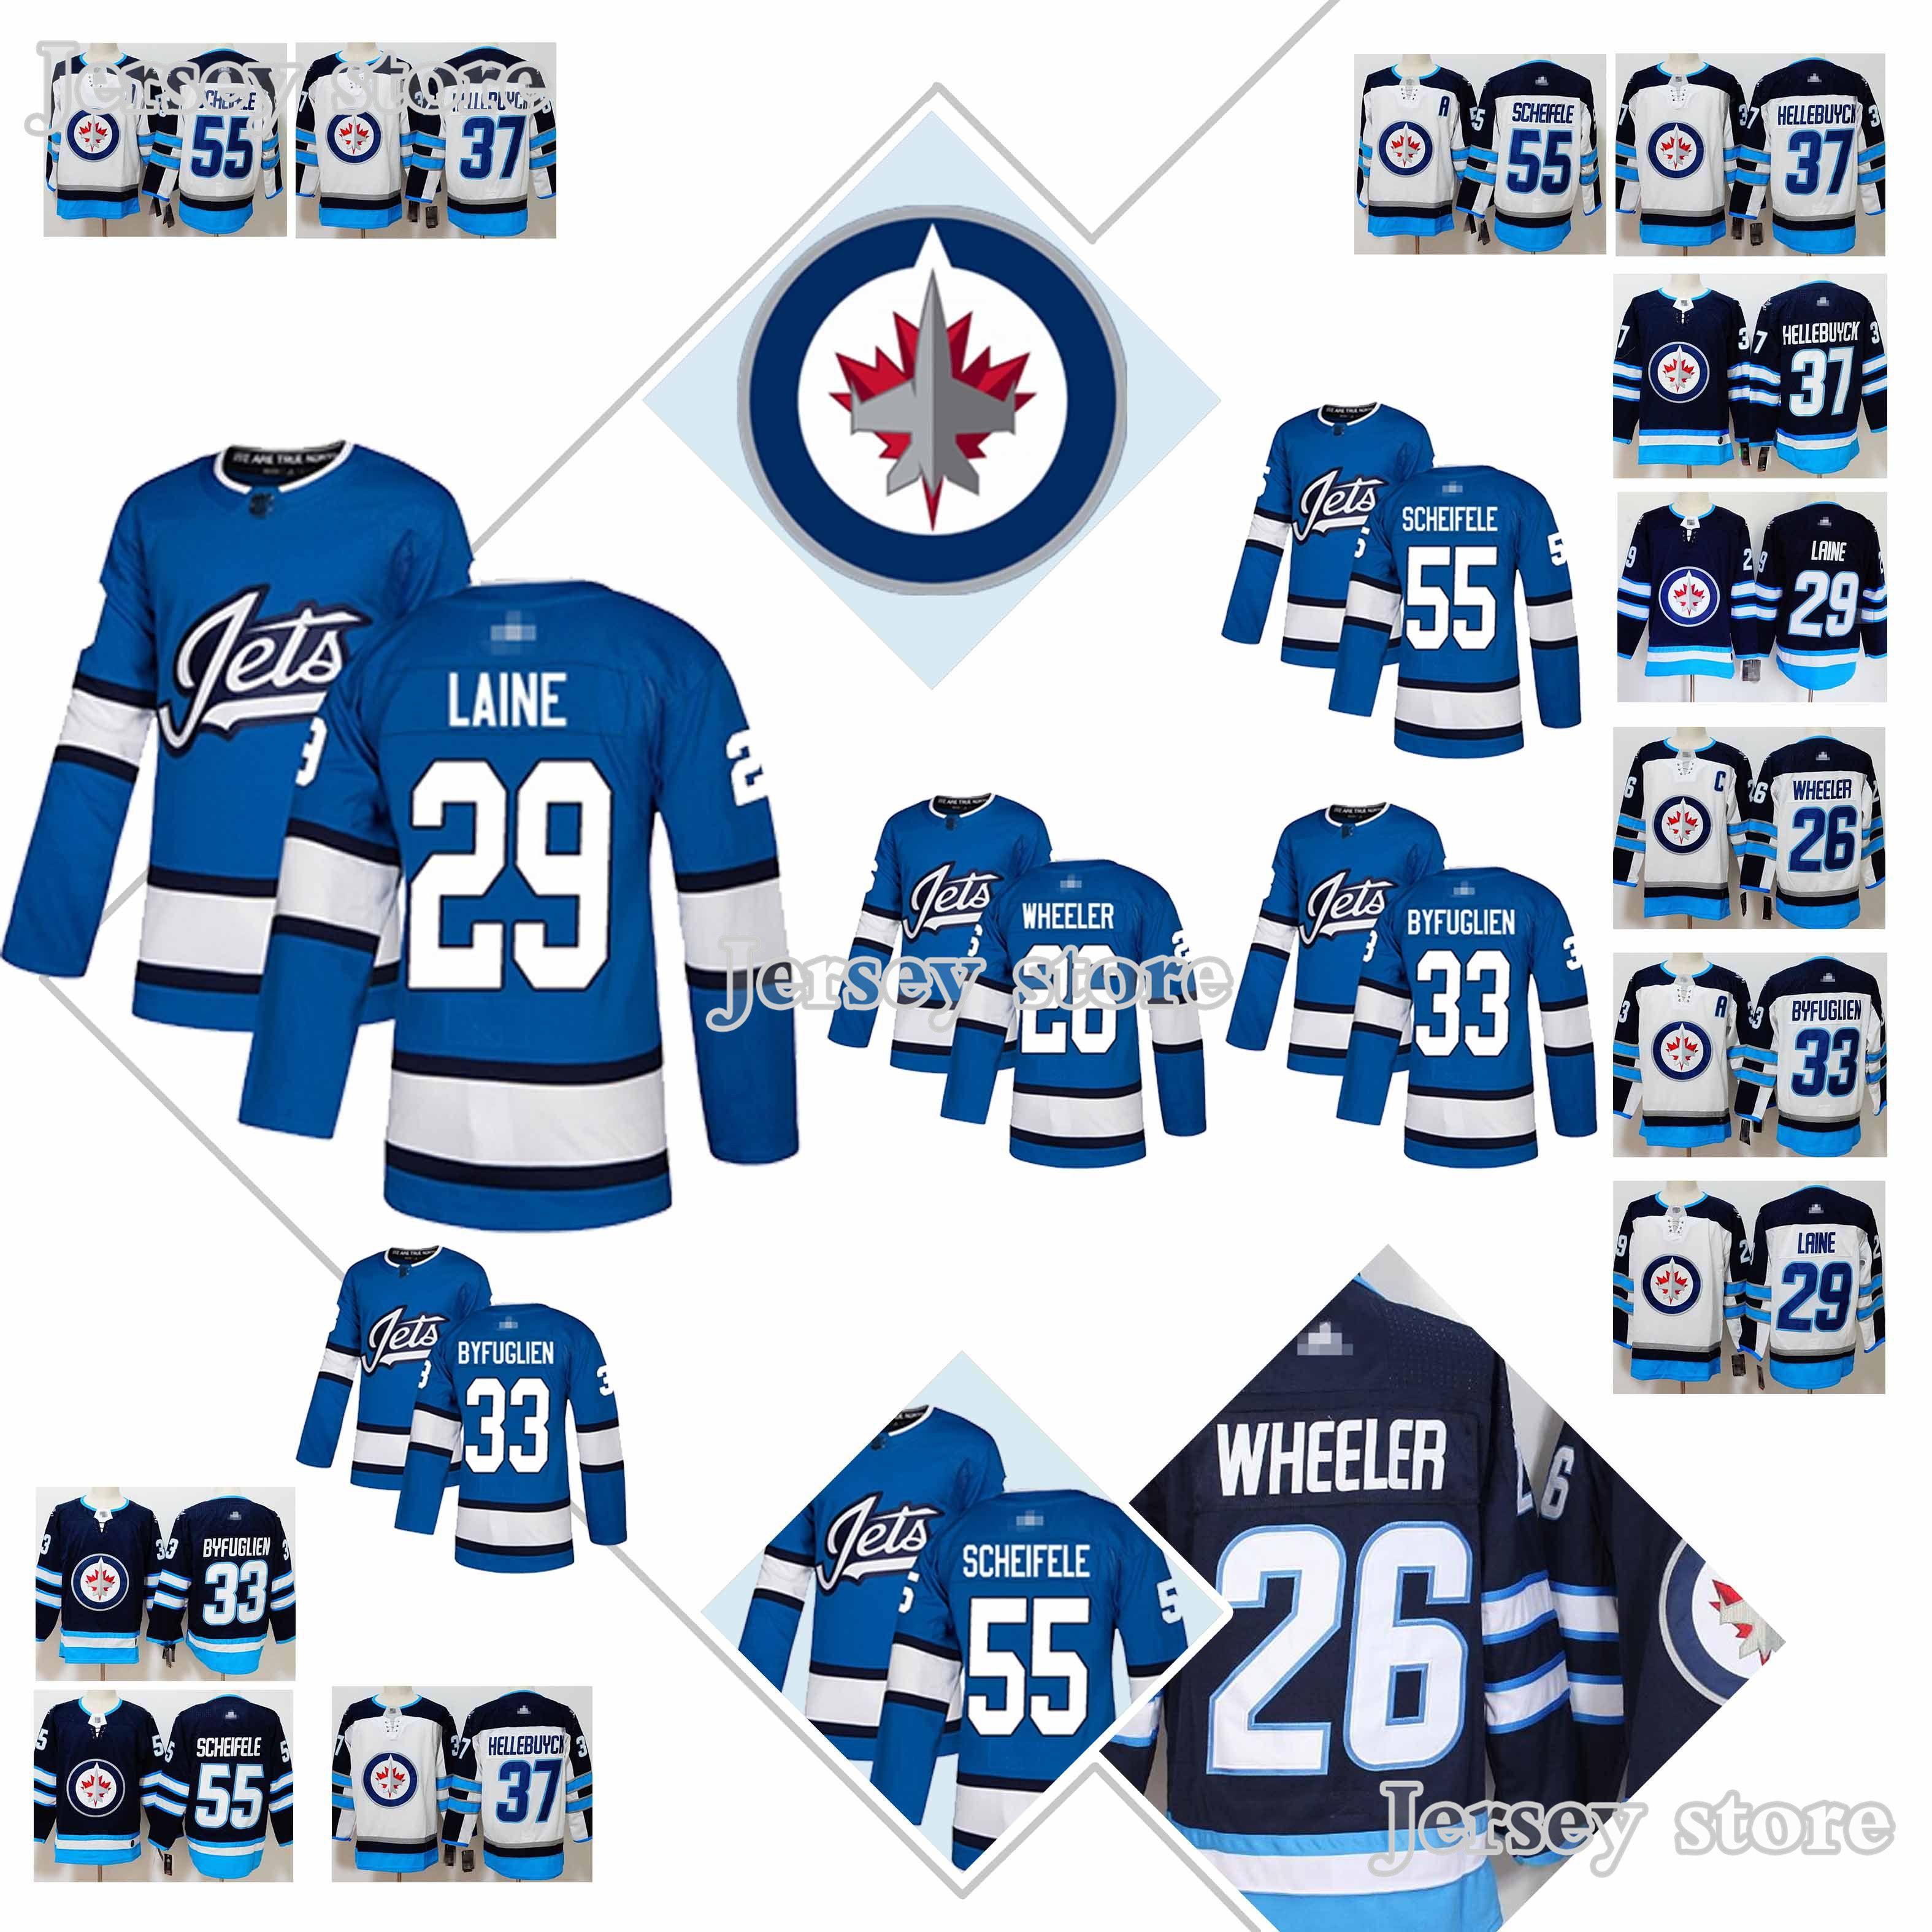 reputable site aaa76 e30ab Winnipeg Jets Jerseys #26 Blake Wheeler #29 Patrik Laine #33 Dustin  Byfuglien #55 Mark Scheifele #37 Connor Hellebuyck new Hockey Jersey